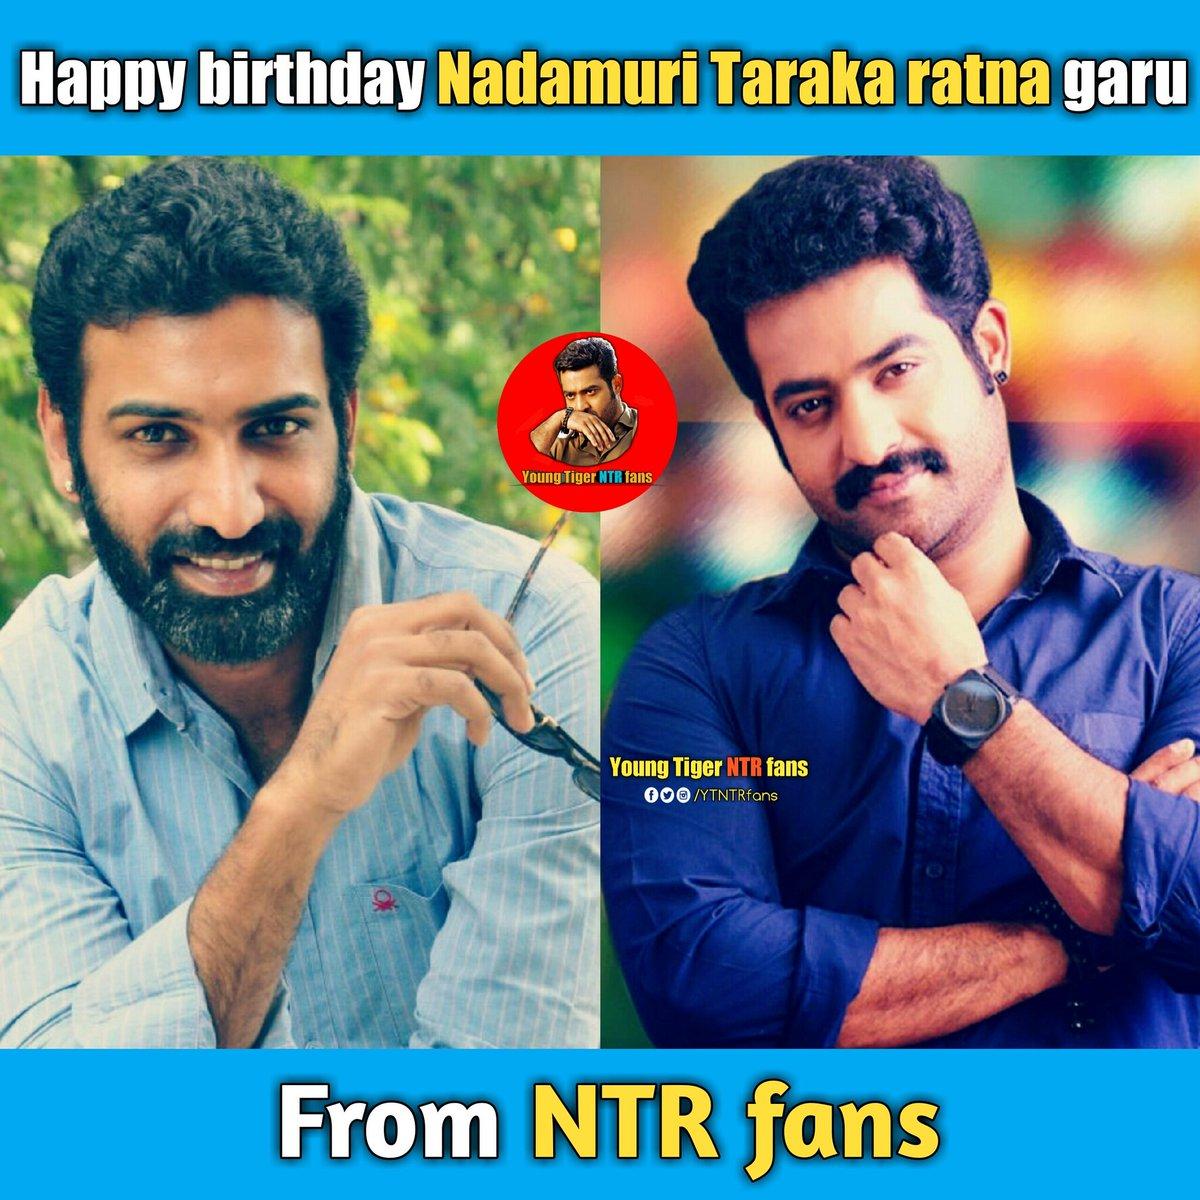 #Happy birthday #Nandamuri_taraka_ratna_garu #from #NTR_fans Follow us on  http://www. facebook.com/YTNTRfans  &nbsp;  <br>http://pic.twitter.com/HhwJc2MGdU